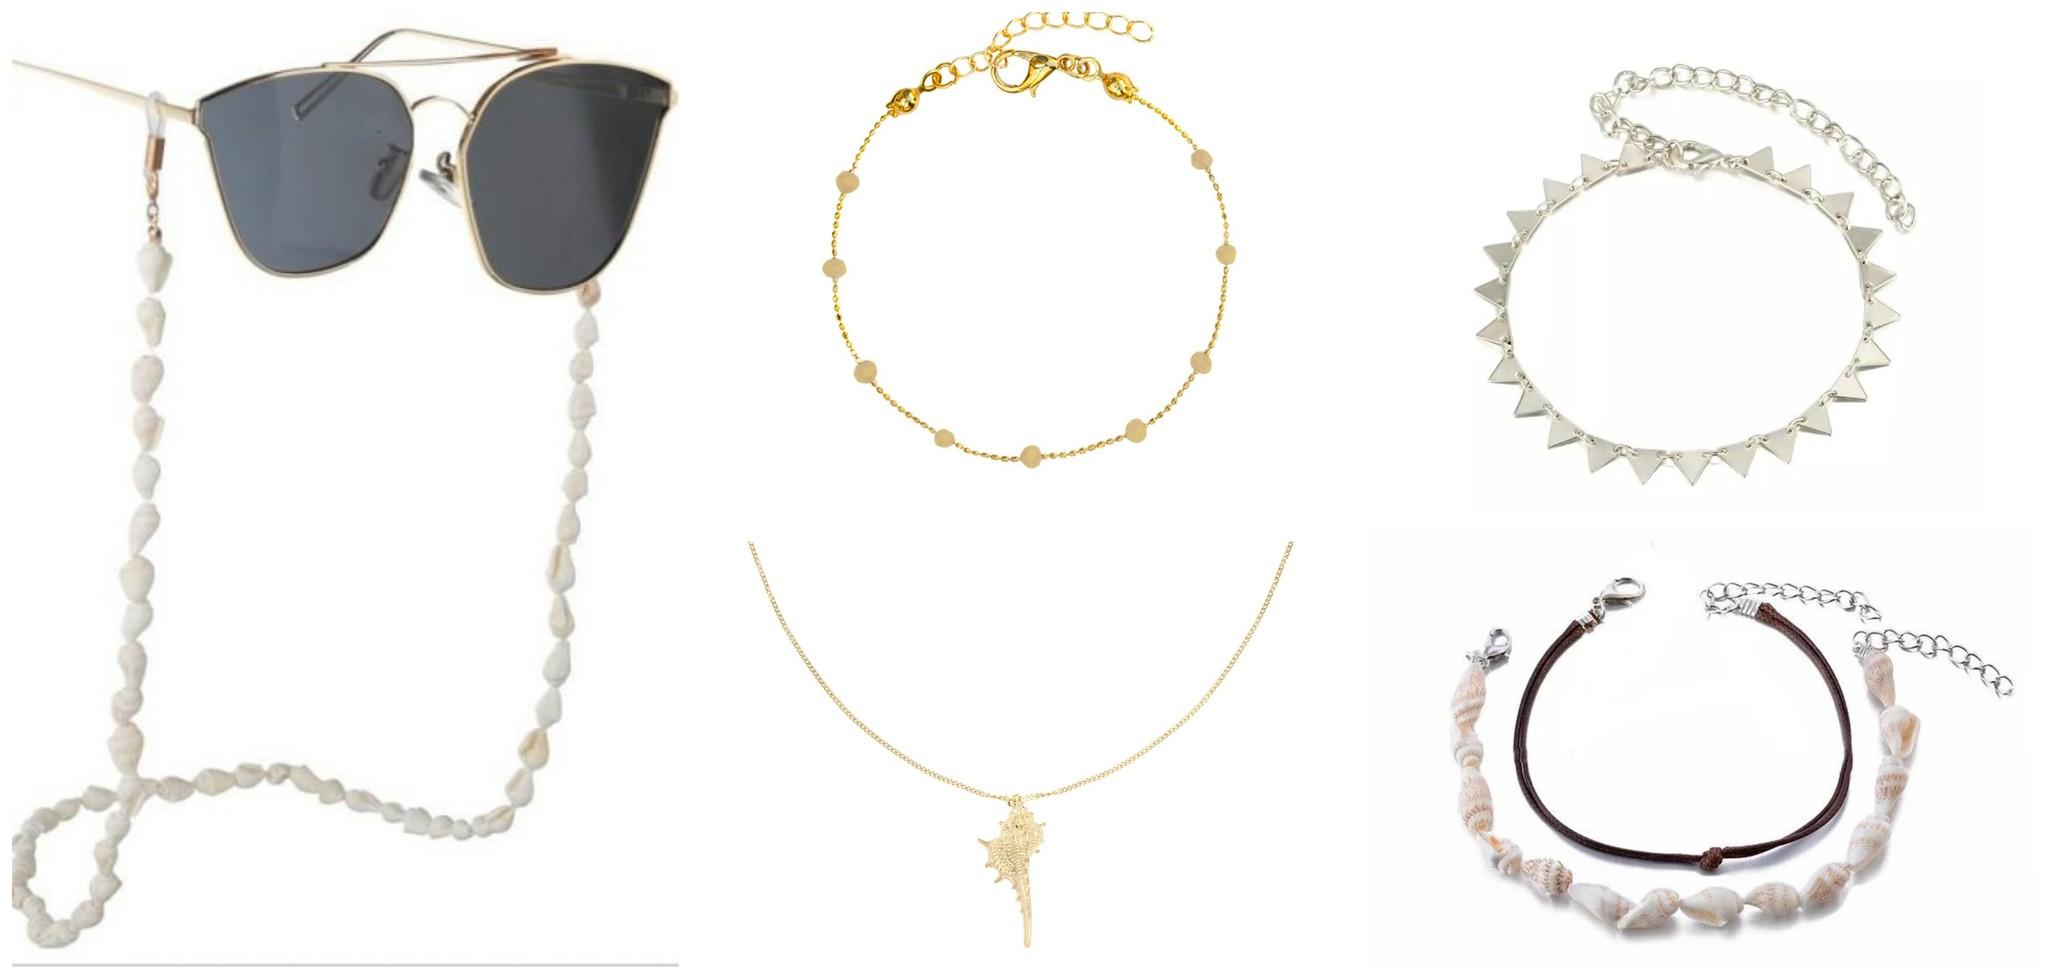 accessoires strand outfit brillenkoord shell sieraden enkelbandjes